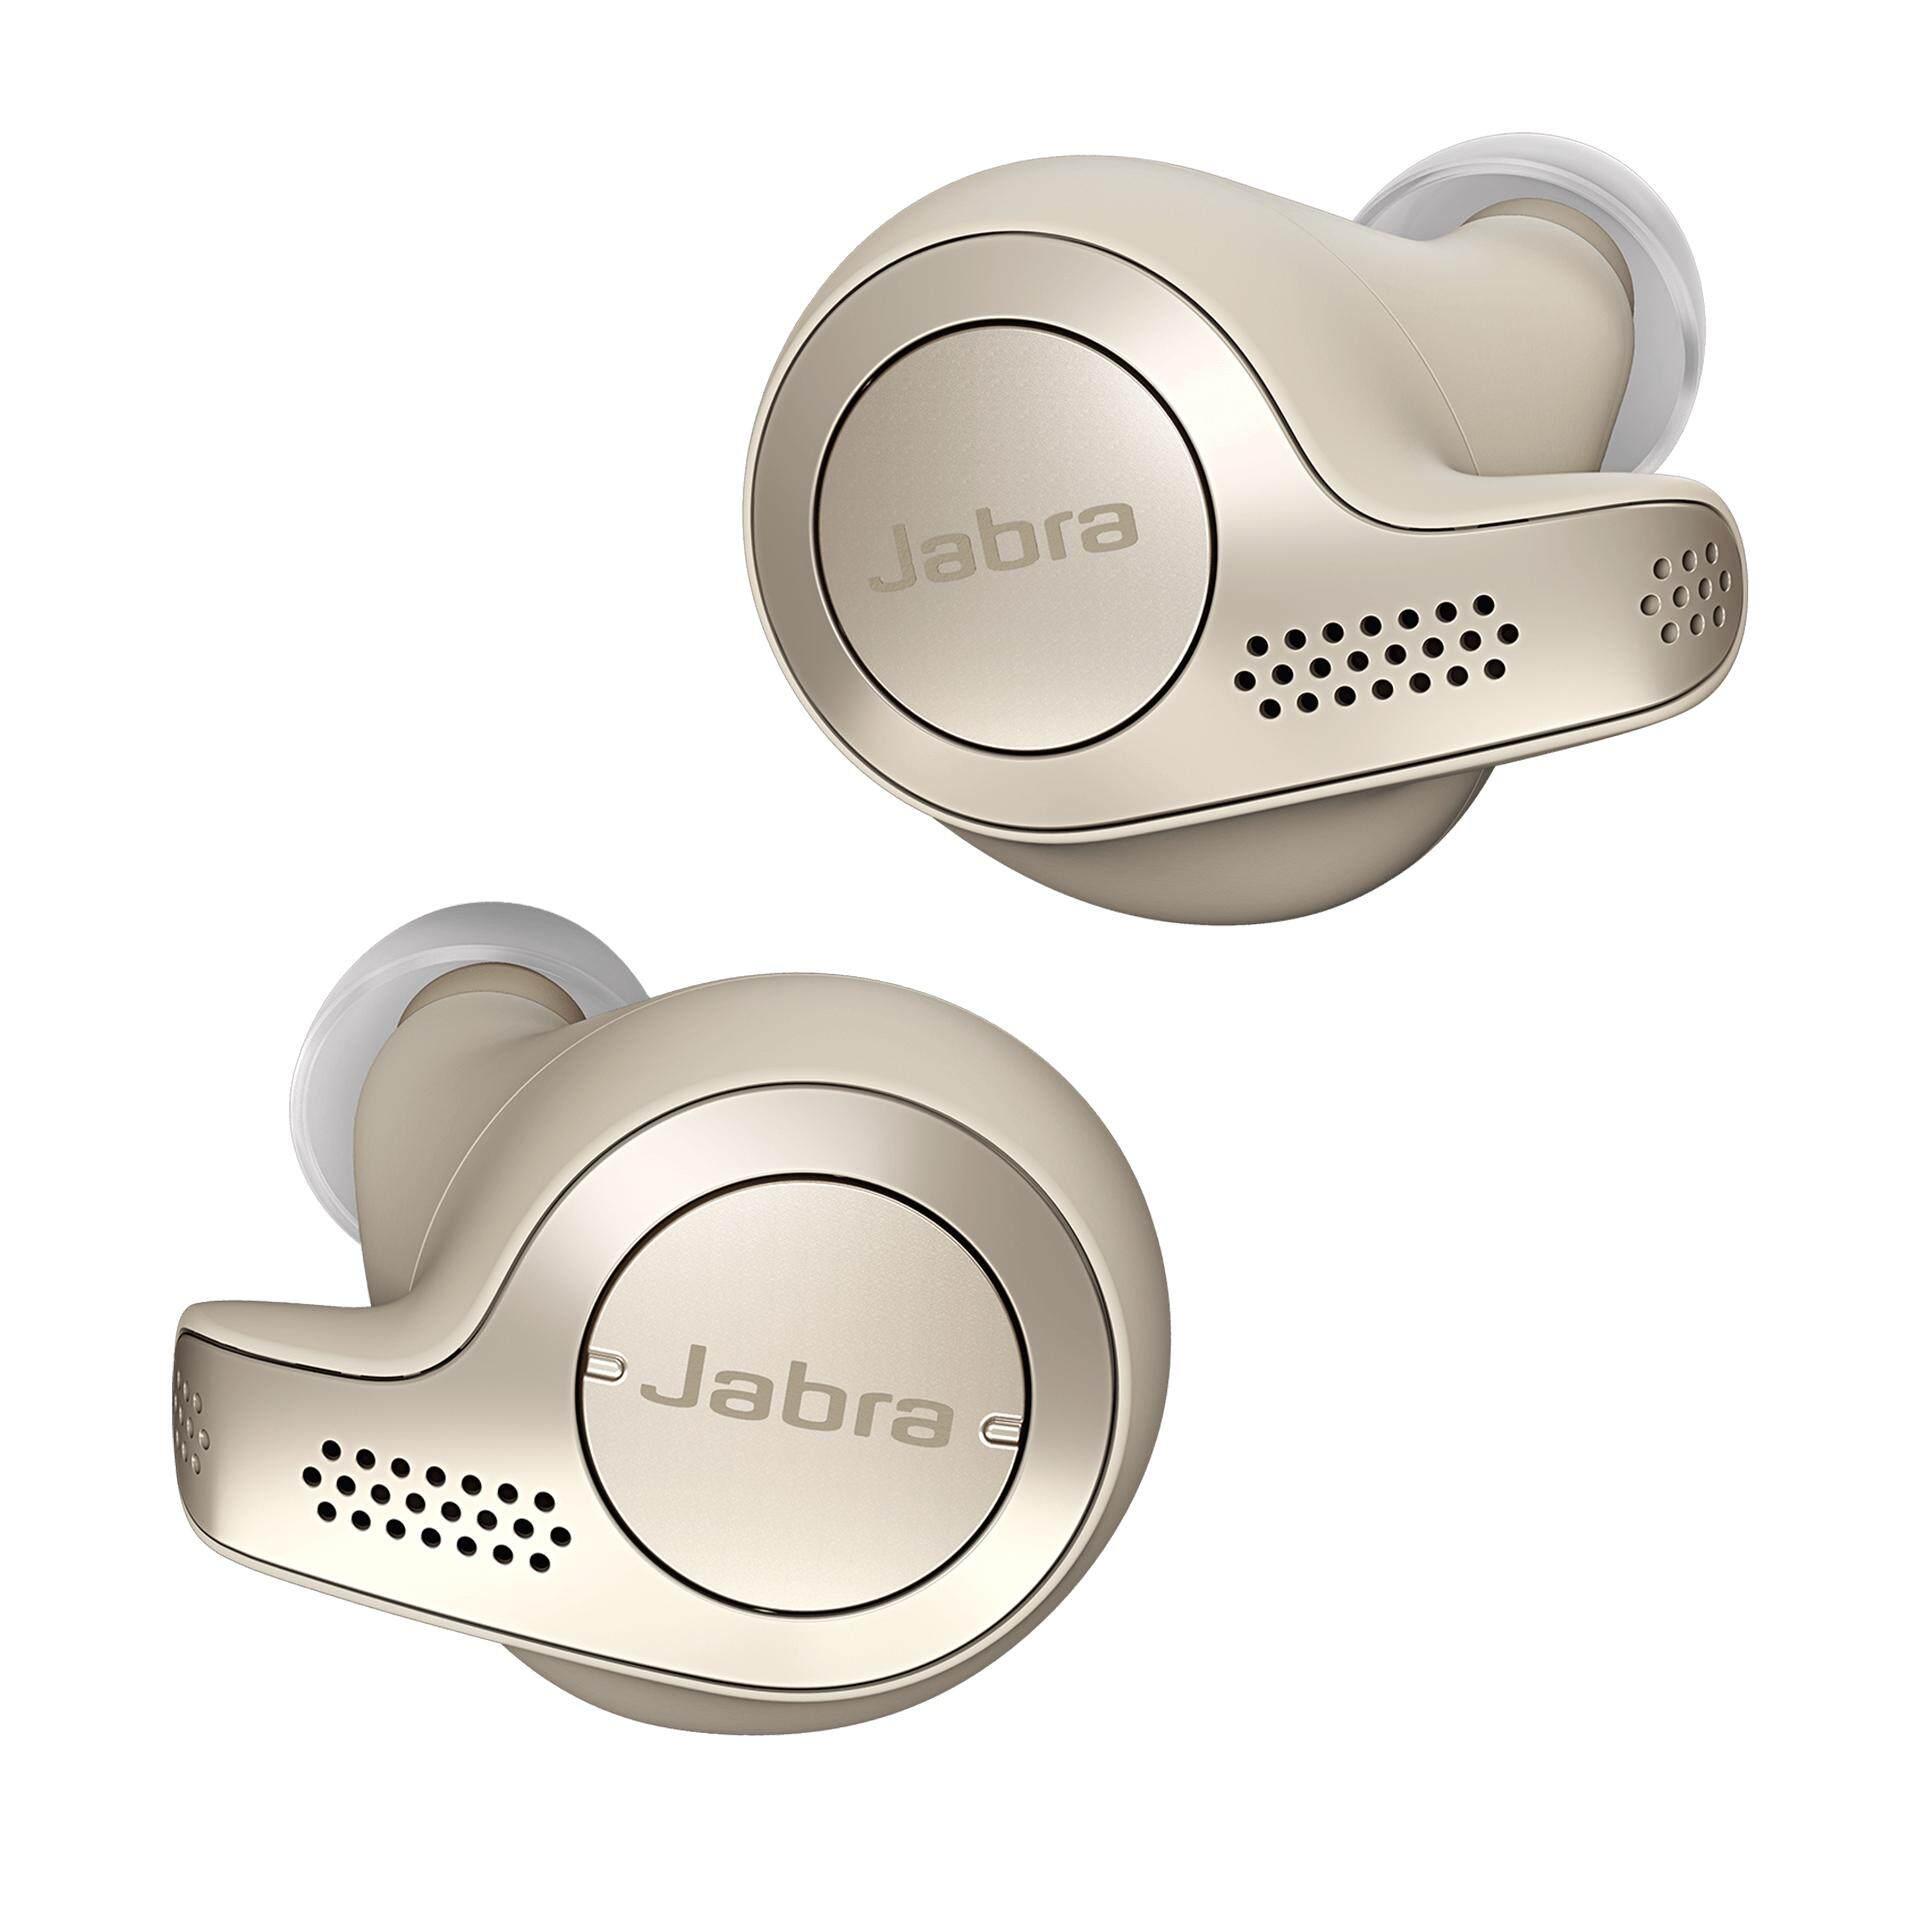 Jabra Headphones Headsets Price In Malaysia Best Rox Bluetooth Earphone Putih Limited Elite 65t True Wireless Earbuds Gold Beige Edition 2 Years Warranty